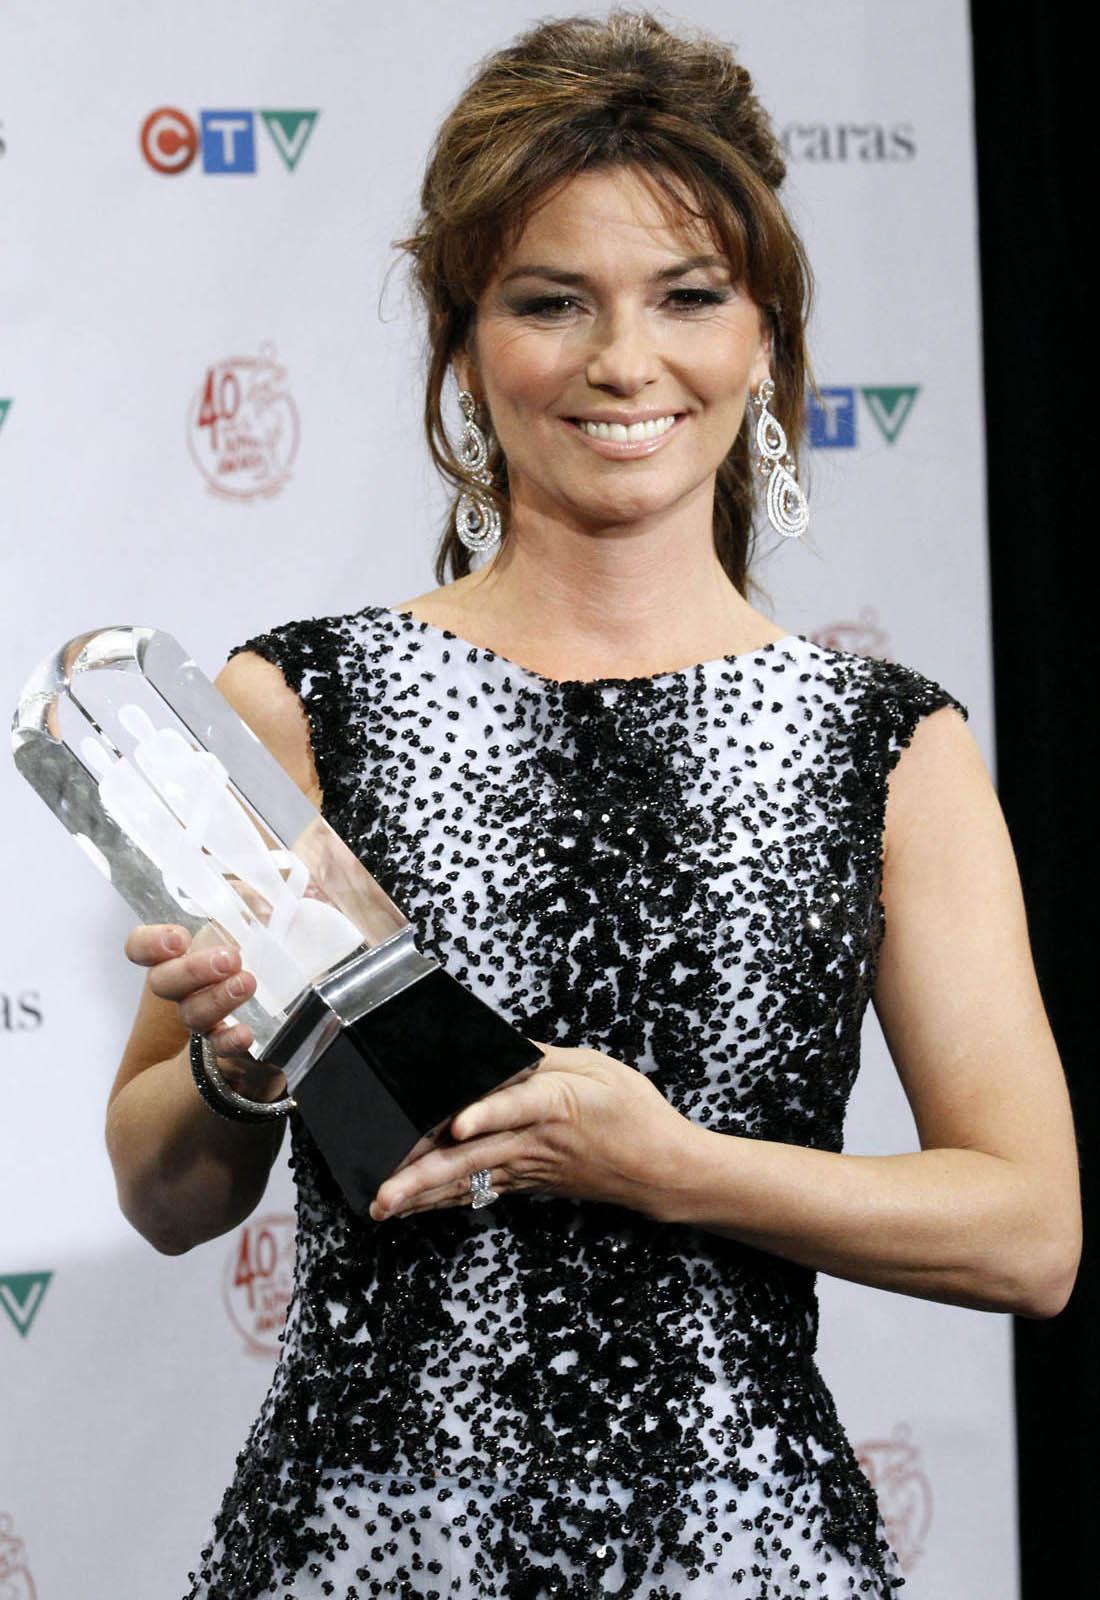 http://2.bp.blogspot.com/-wF-iOVihbGk/TZFoFXPrVsI/AAAAAAAACiA/WFCLZpvqNms/s1600/shania_twain_juno_awards.jpg